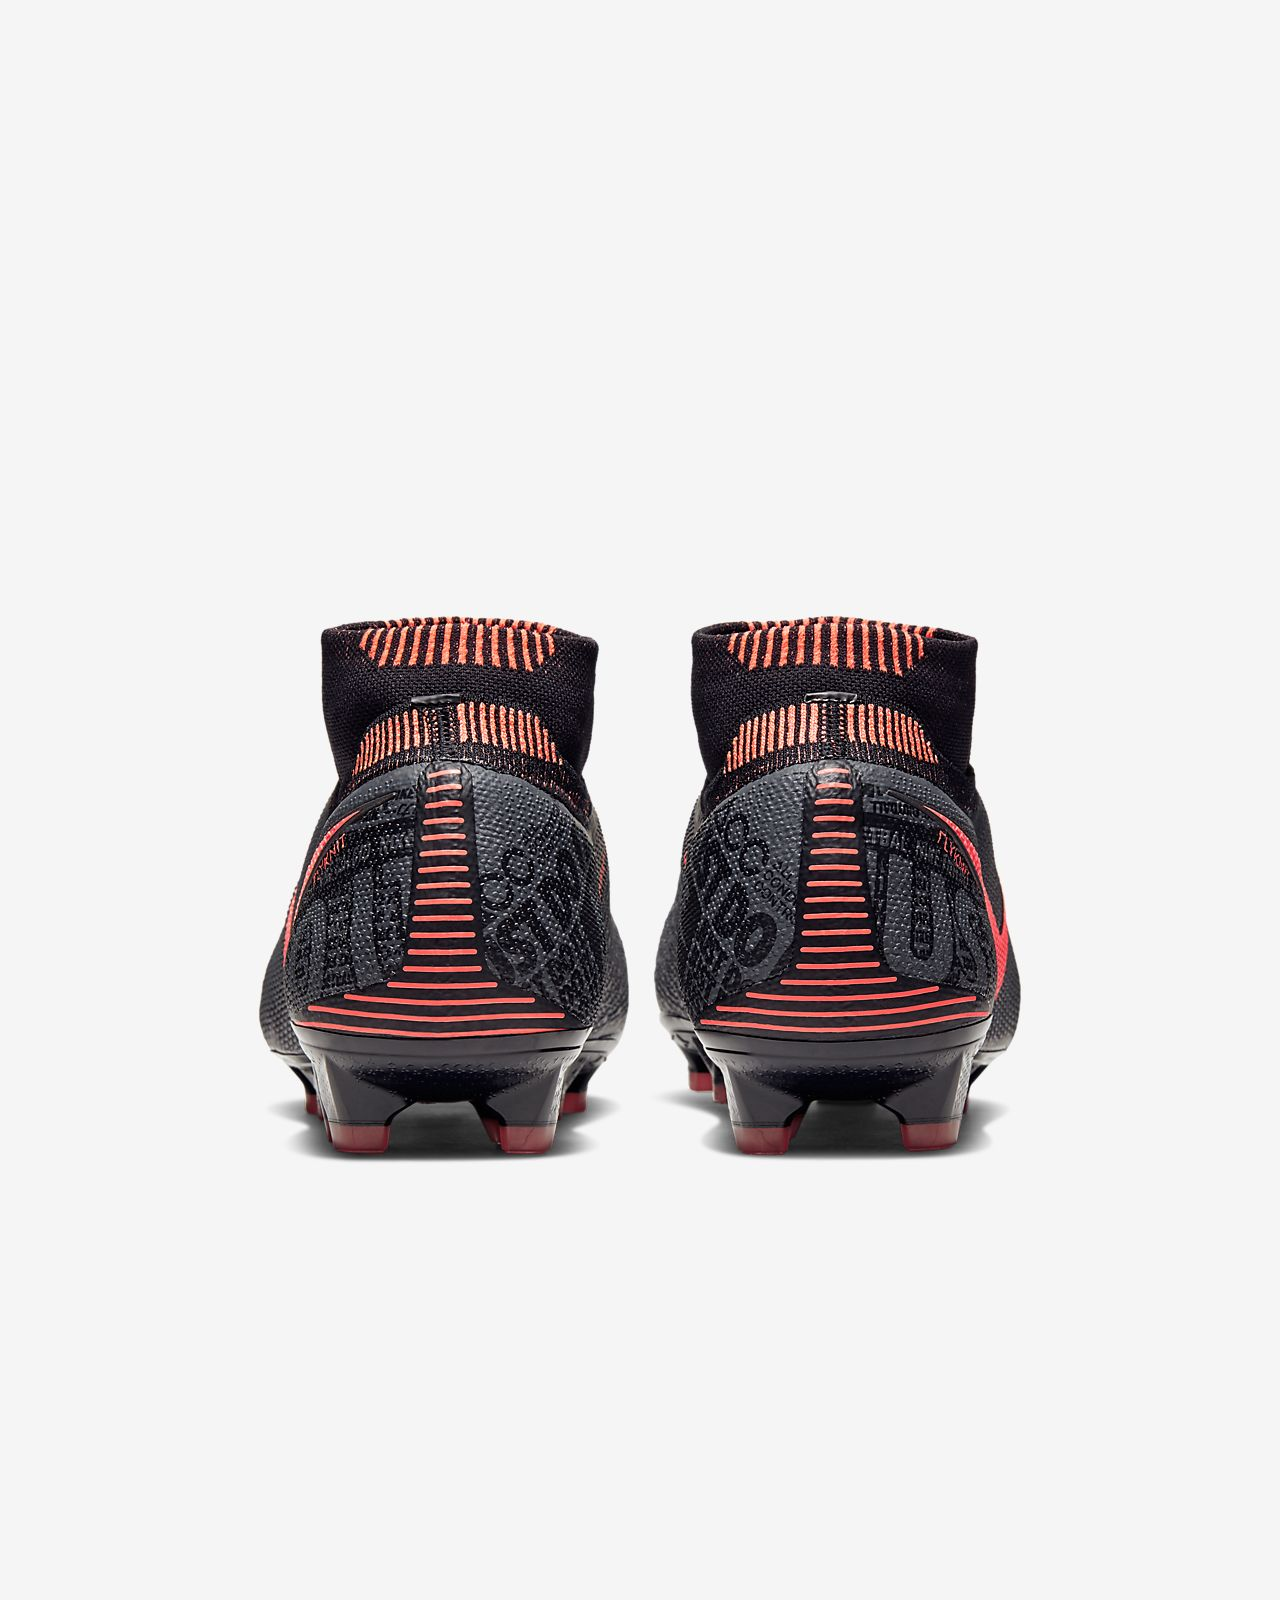 Nike Phantom Vision Elite Dynamic Fit FG Firm Ground Football Boot